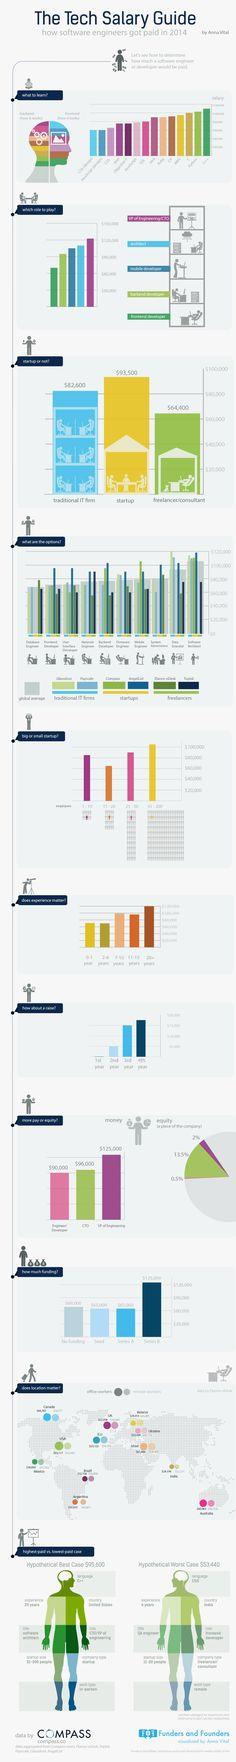 software engineer salary 2014 - infographic